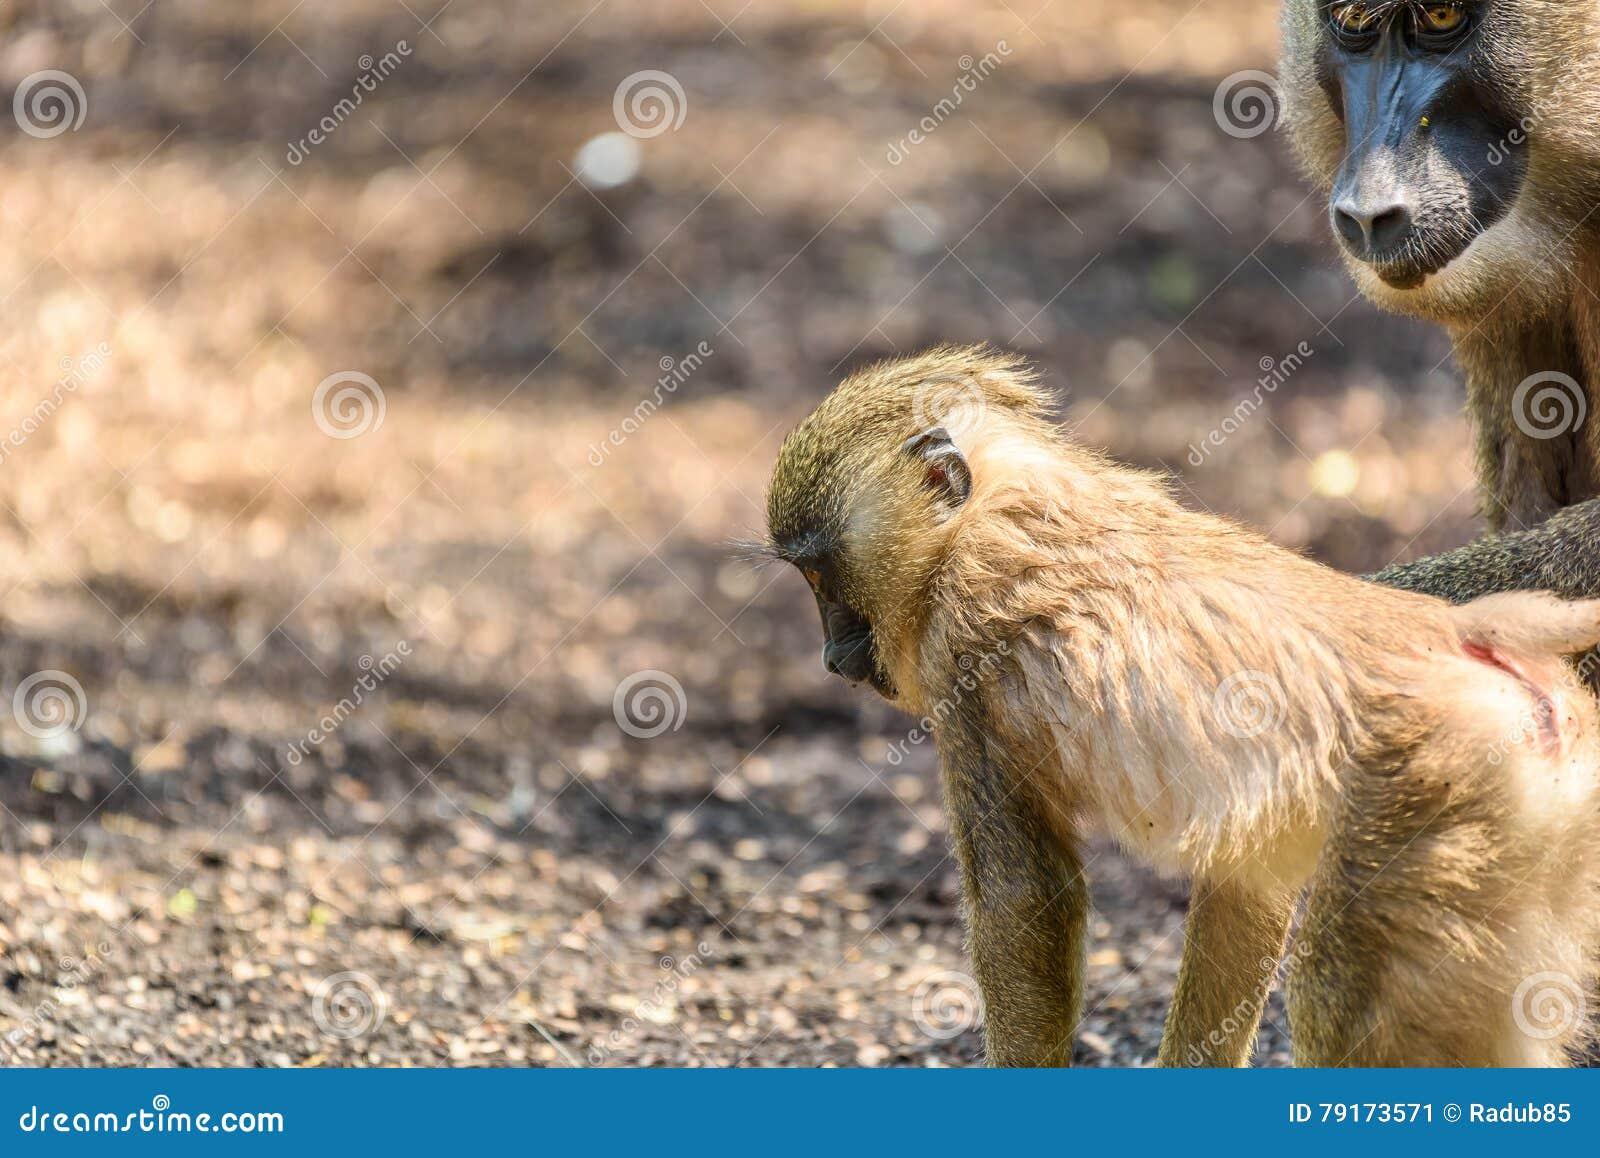 Baby Drill (Mandrillus Leucophaeus) Stock Image - Image of